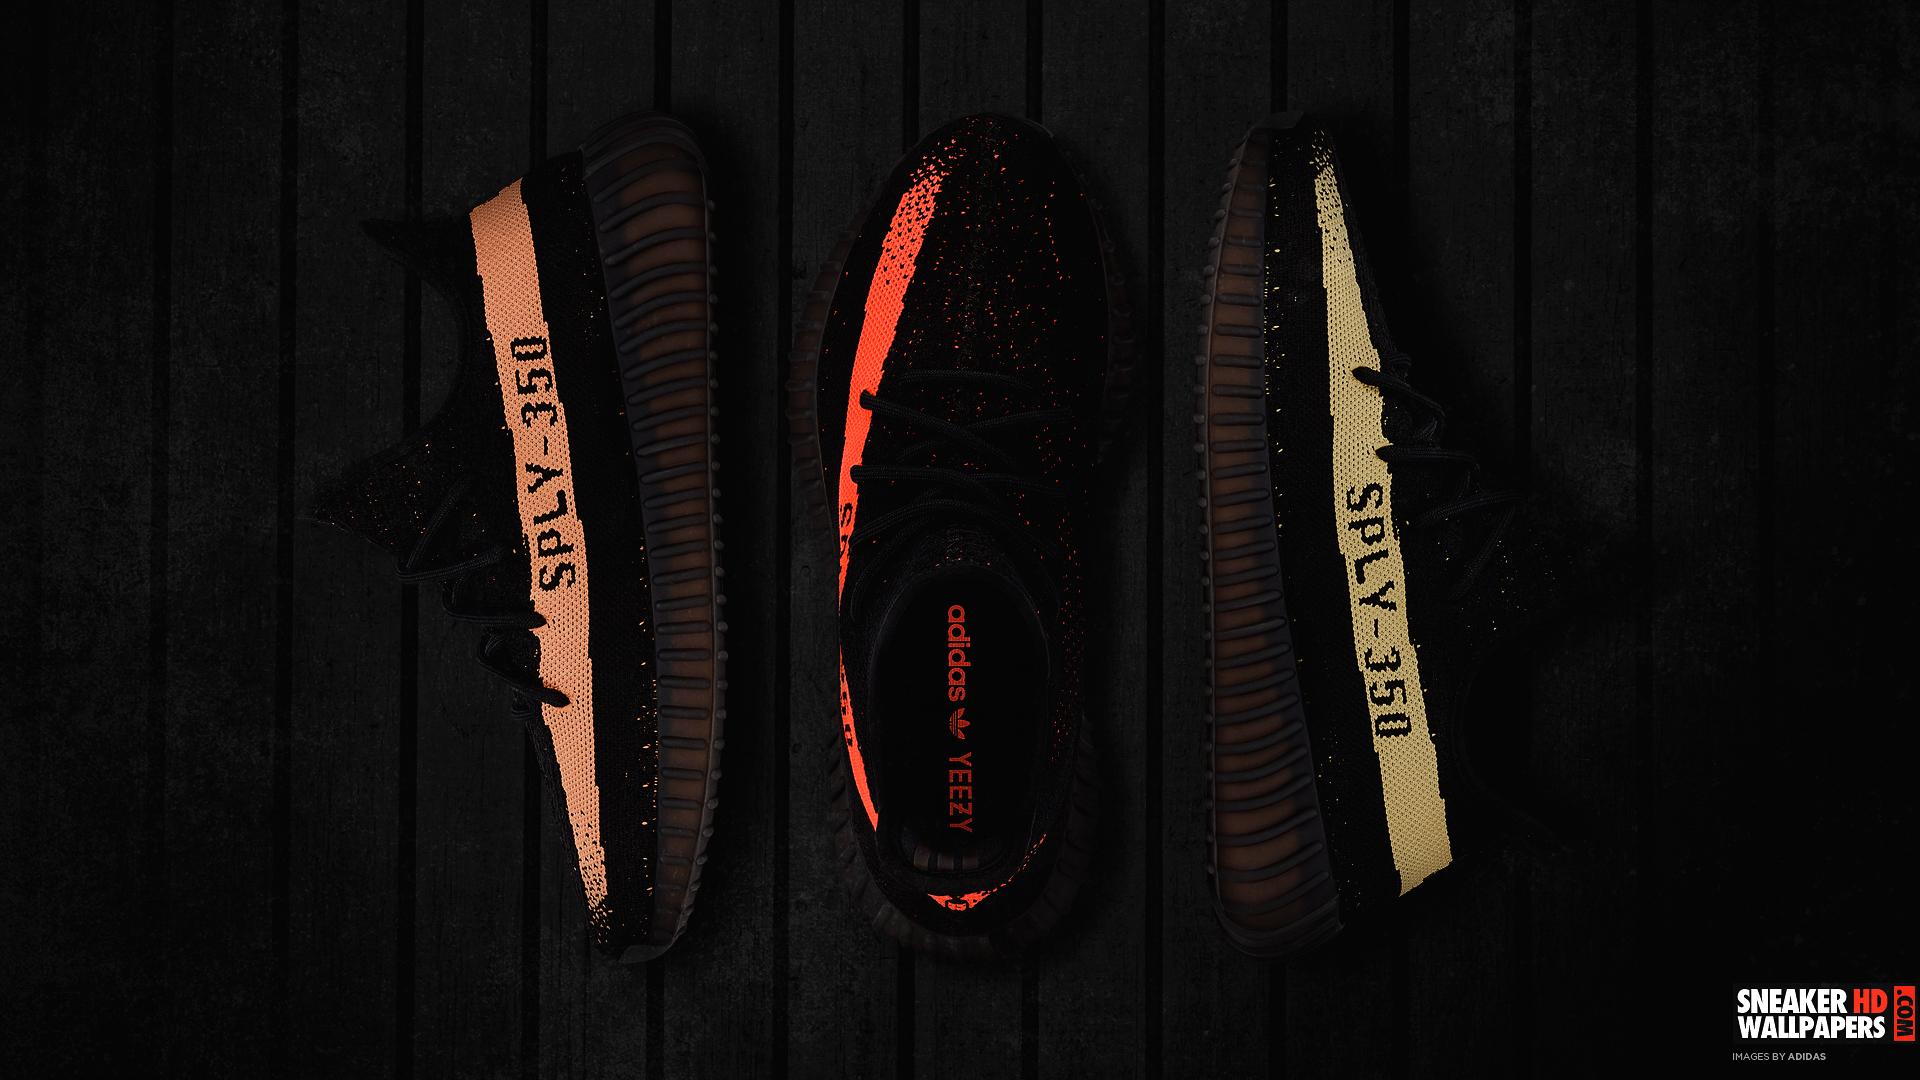 Adidas Wallpaper Iphone 6 Sneakerhdwallpapers Com Your Favorite Sneakers In Hd And